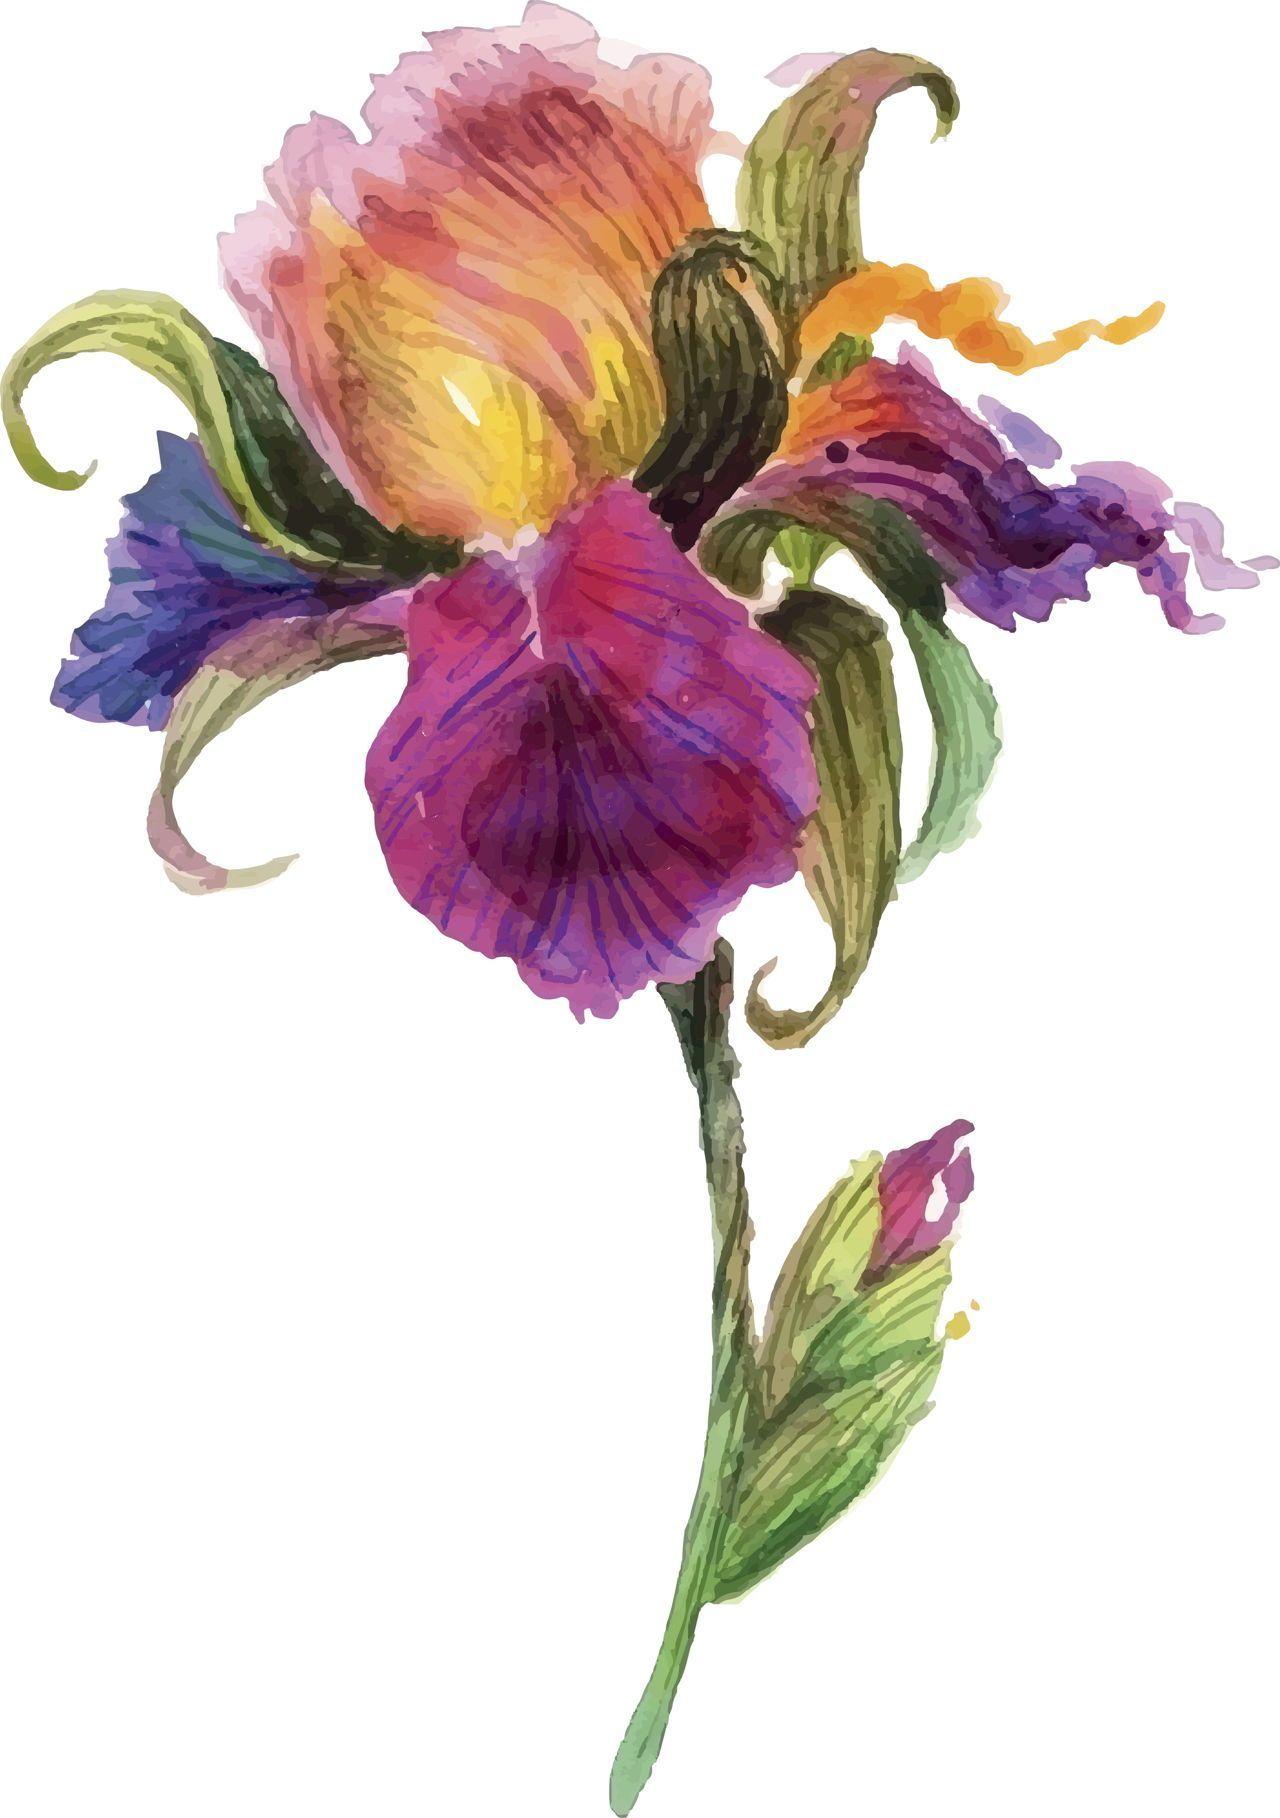 Beautiful Watercolor Iris Flower Watercolorarts Colorful Art Art Painting Iris Art